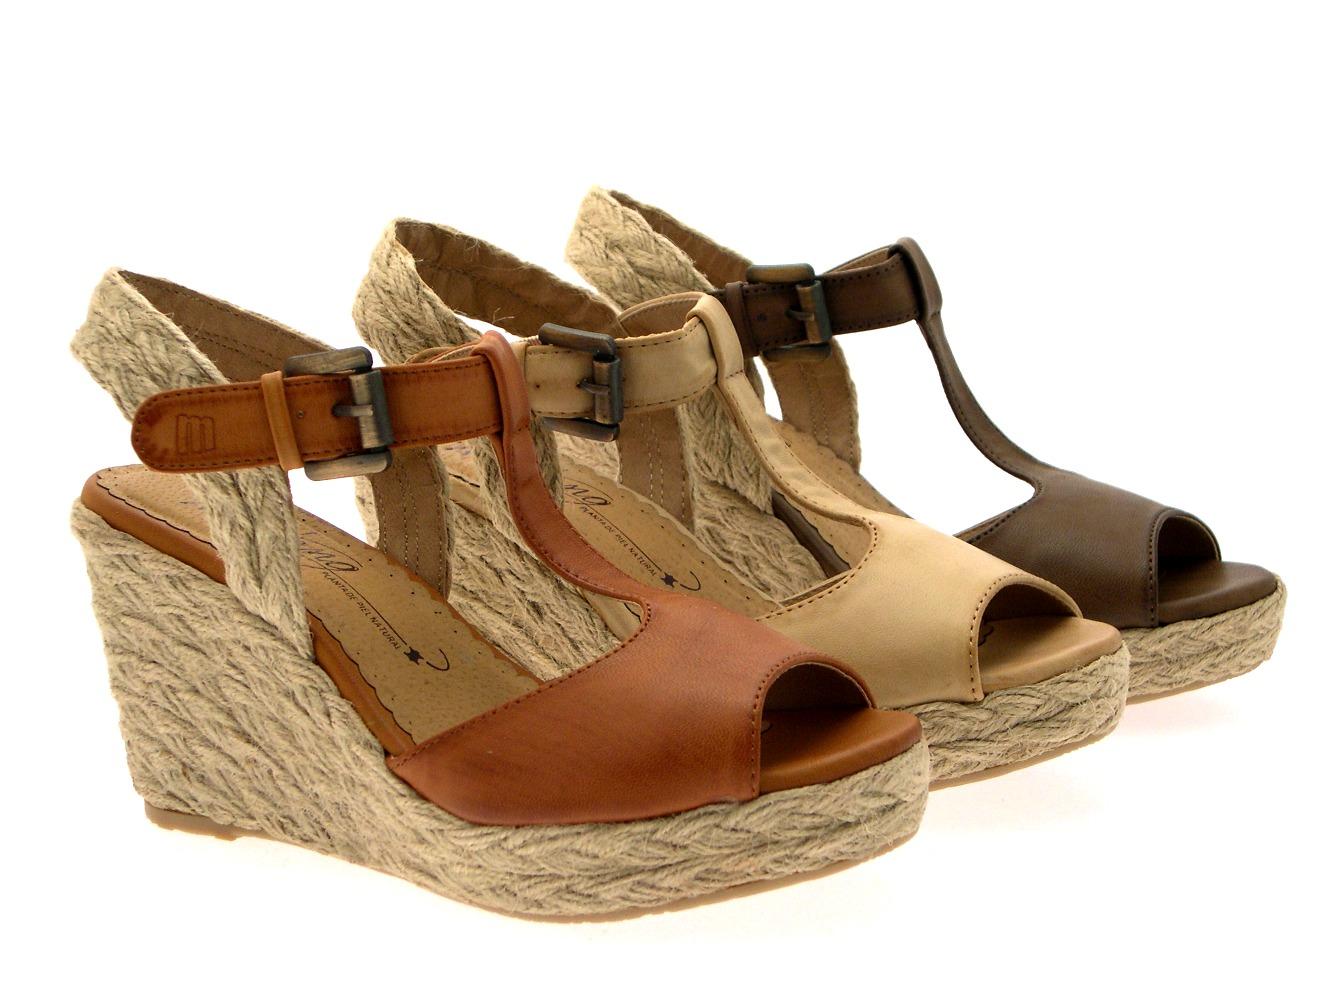 Cool  Rope Sandals  Neptune Style Beige Women 8 Jesus Sandal Handmade